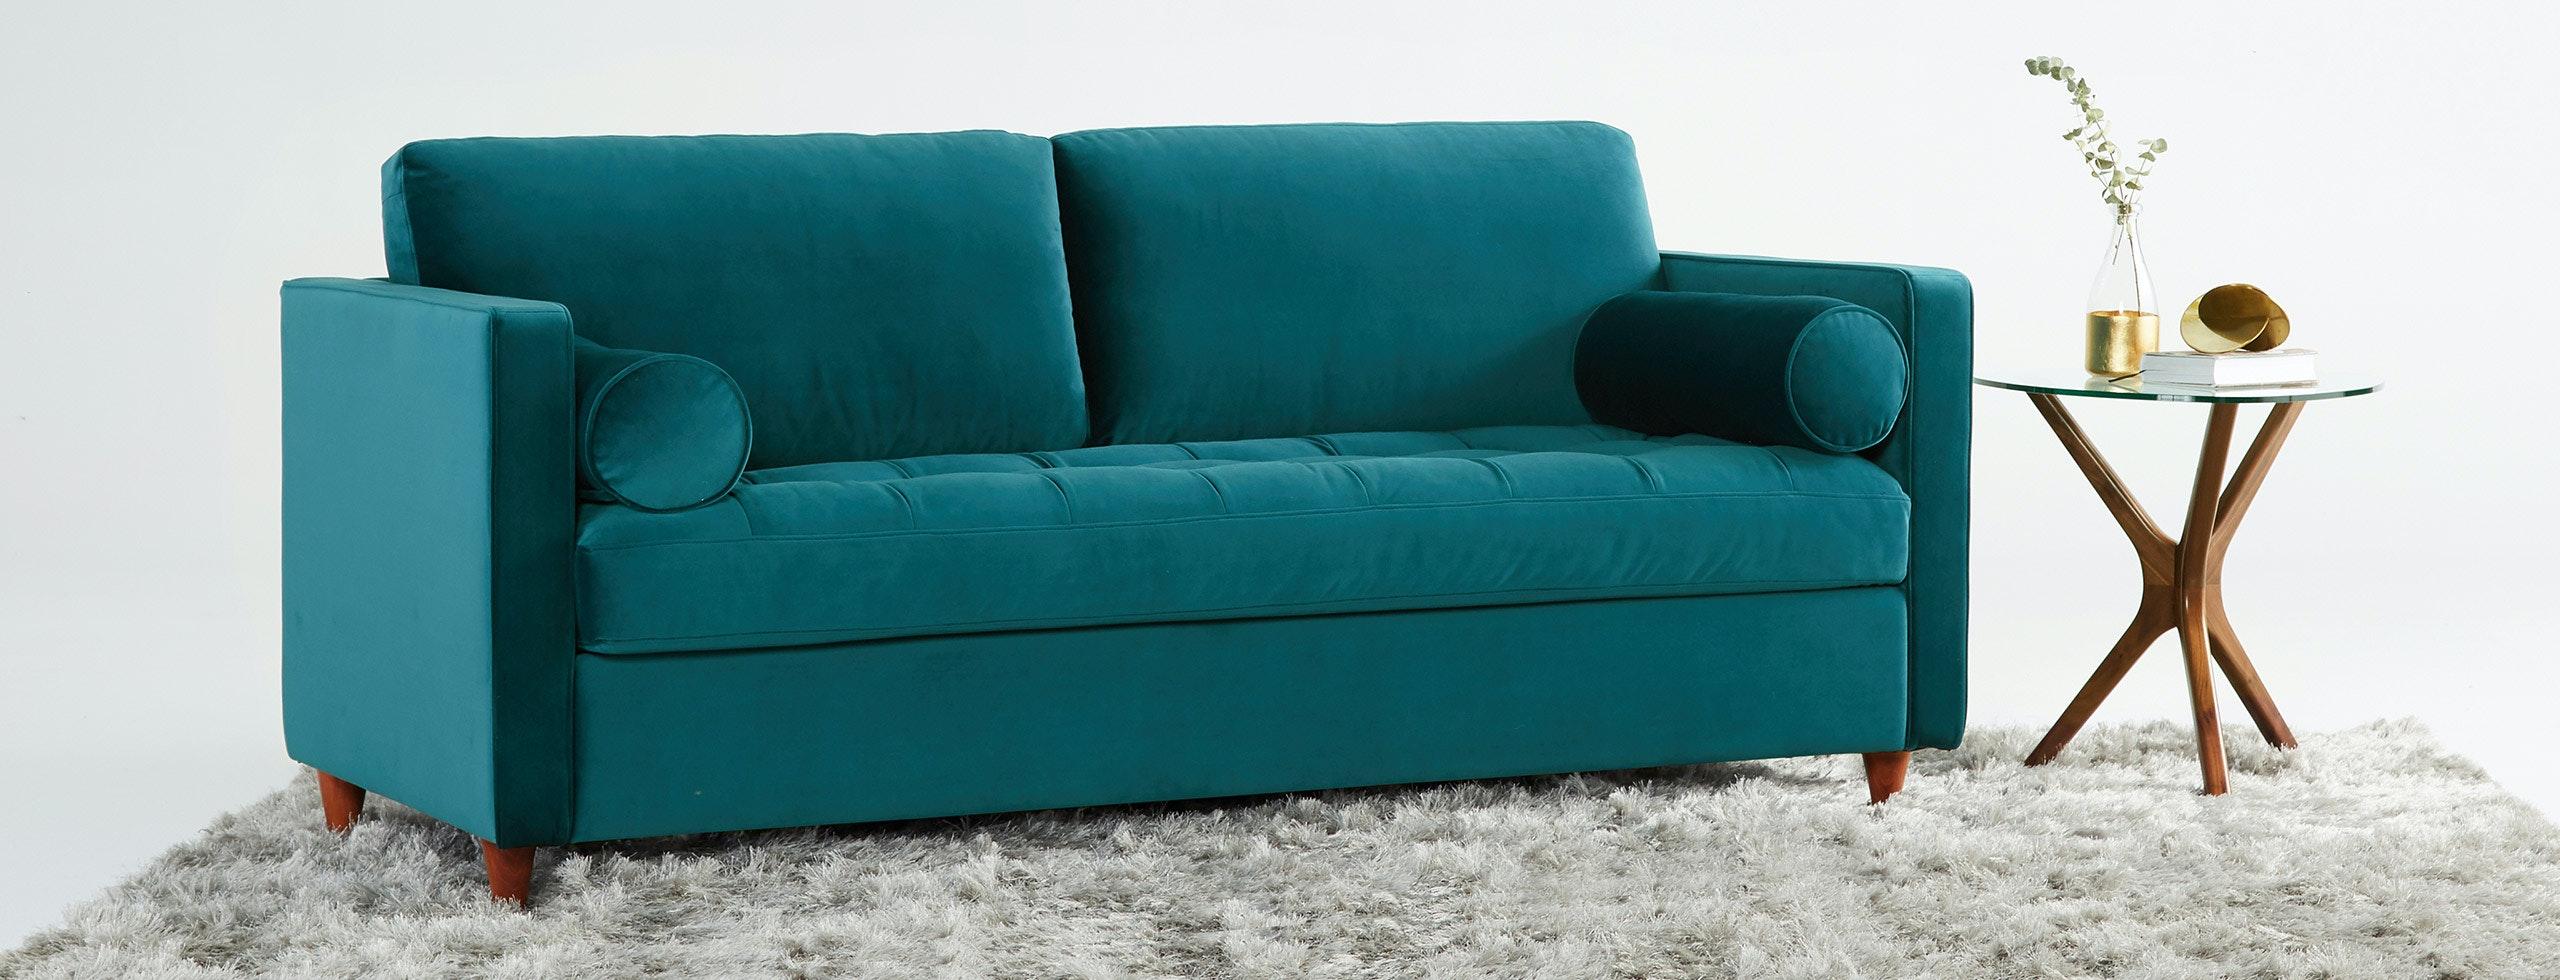 briar sleeper sofa joybird rh joybird com blue velvet sleeper sofa velvet tufted sleeper sofa